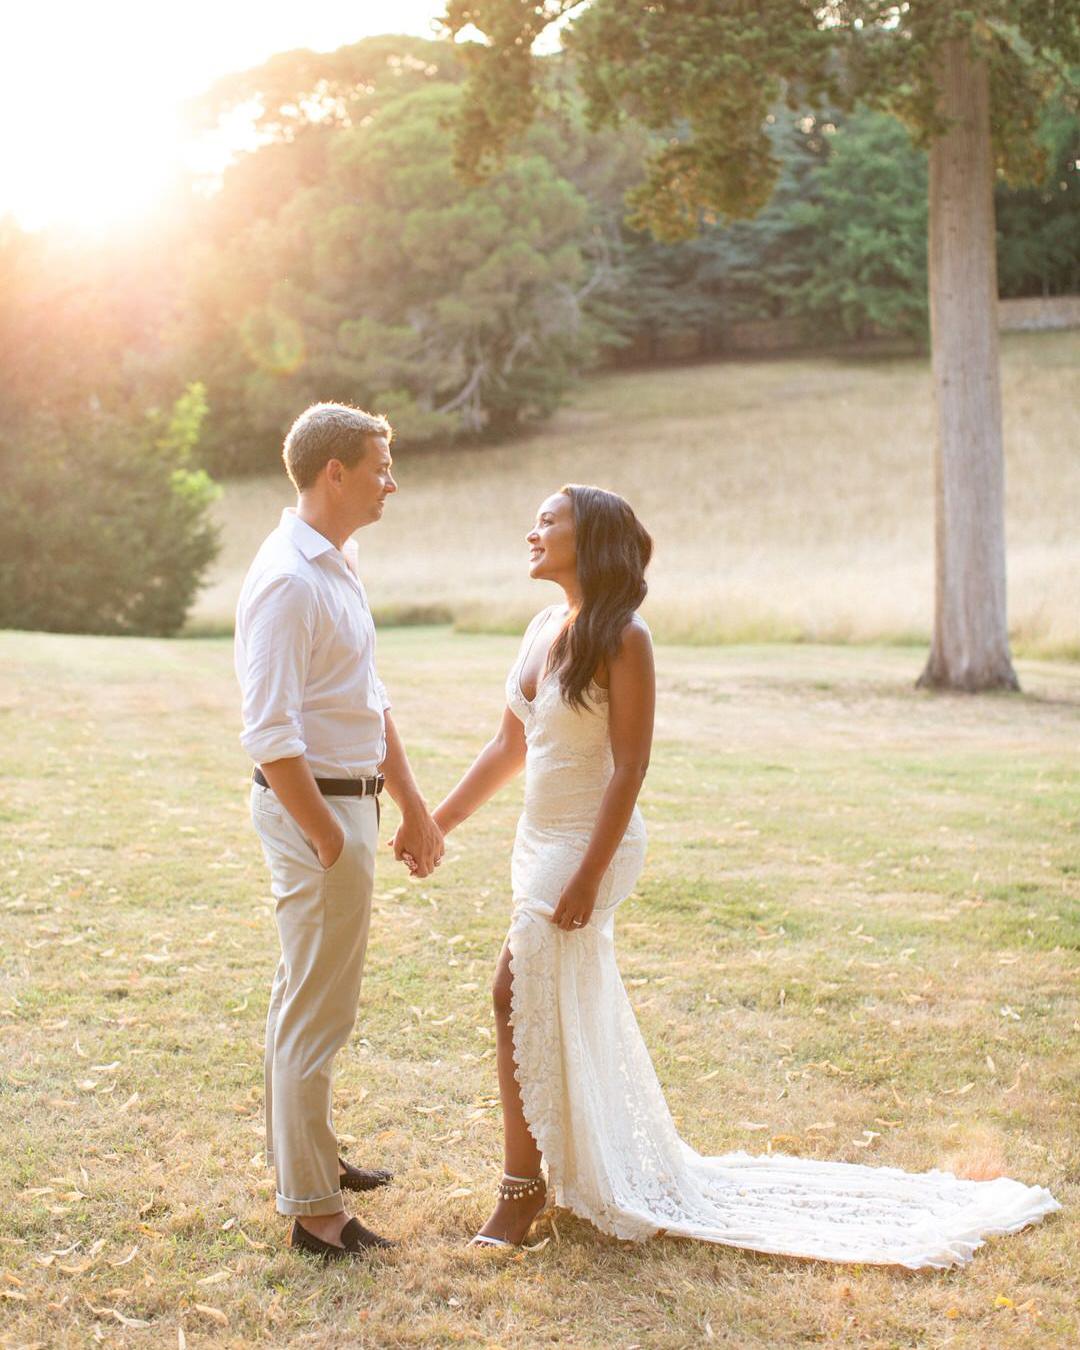 jen tim wedding couple portraits at golden hour